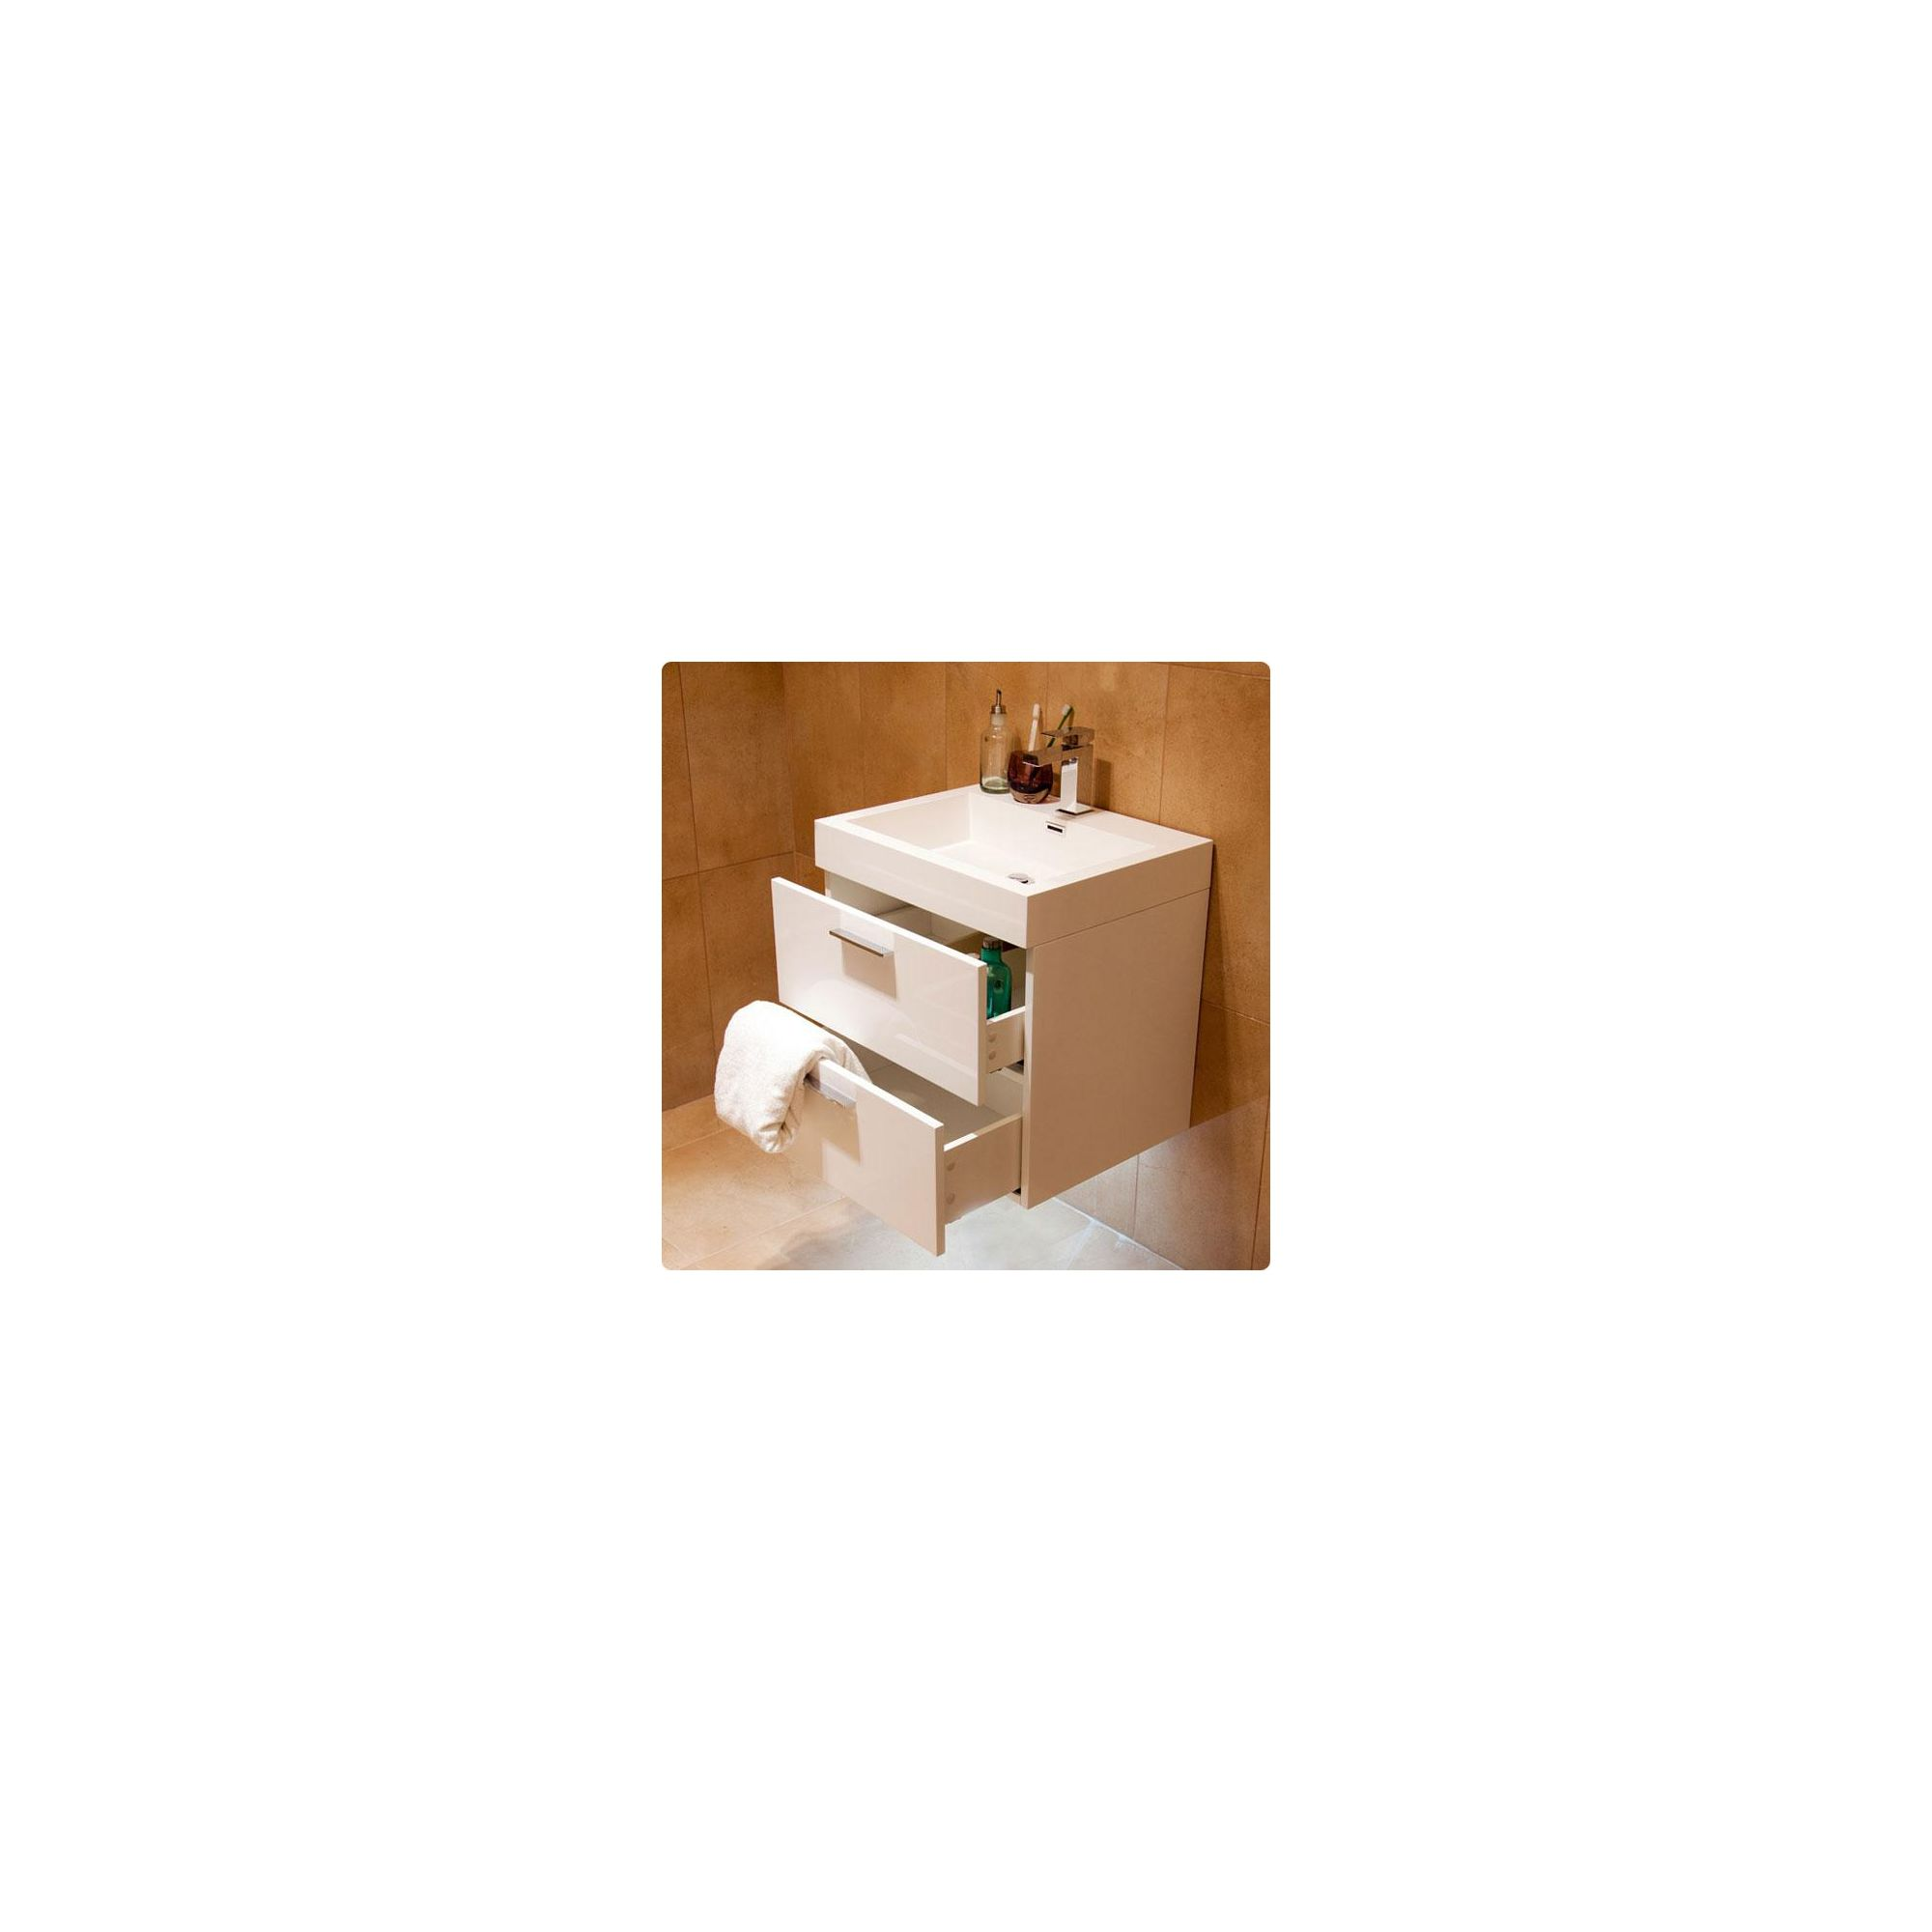 Durab Evolution Bathroom WHITE Vanity Unit including Basin 580mm Wide x 468mm Deep